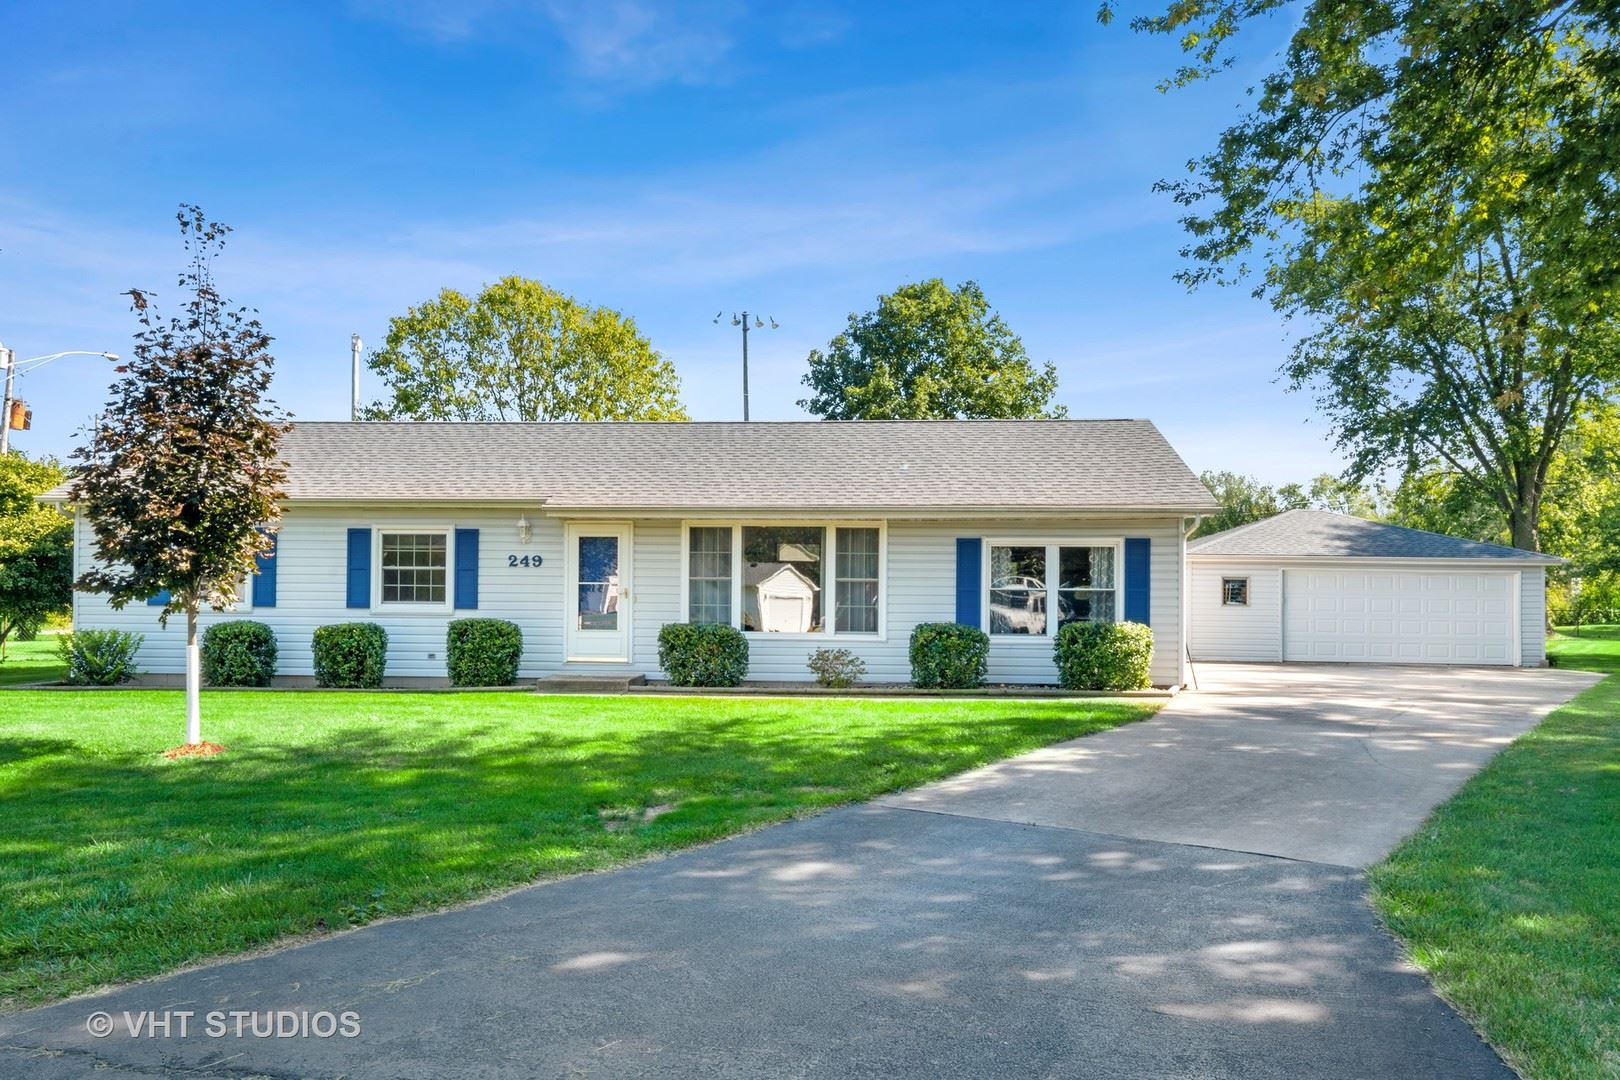 249 Curtis Court, Braidwood, IL 60408 - MLS#: 11234887